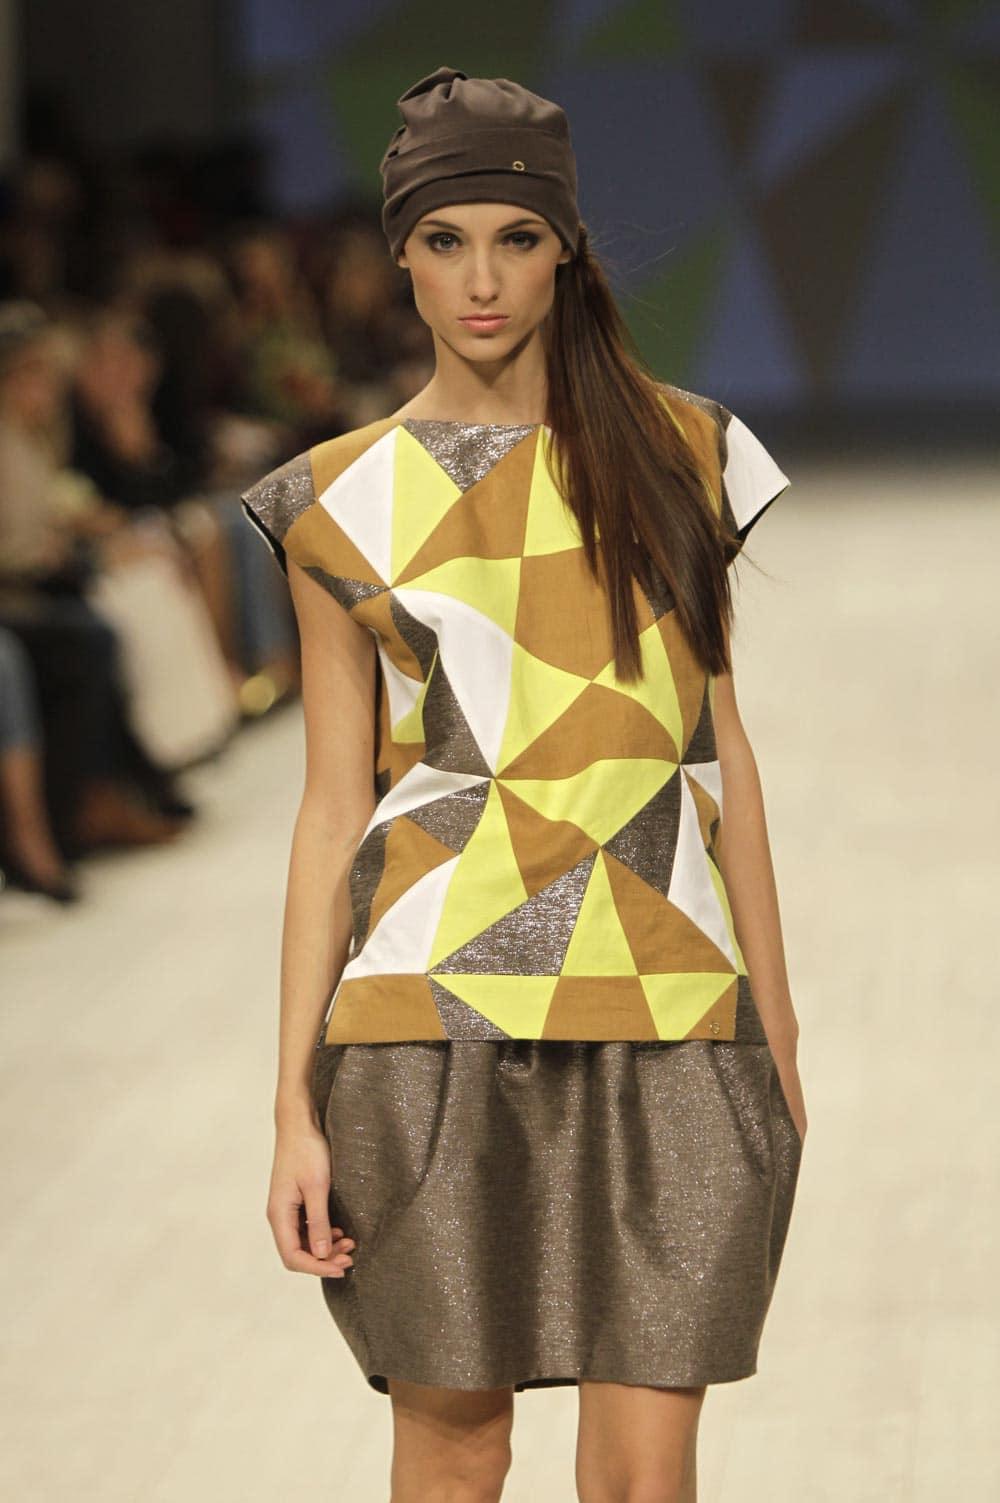 A model displays an outfit by Ukrainian designer Anna Bublik during a Fashion Week in Kiev, Ukraine.